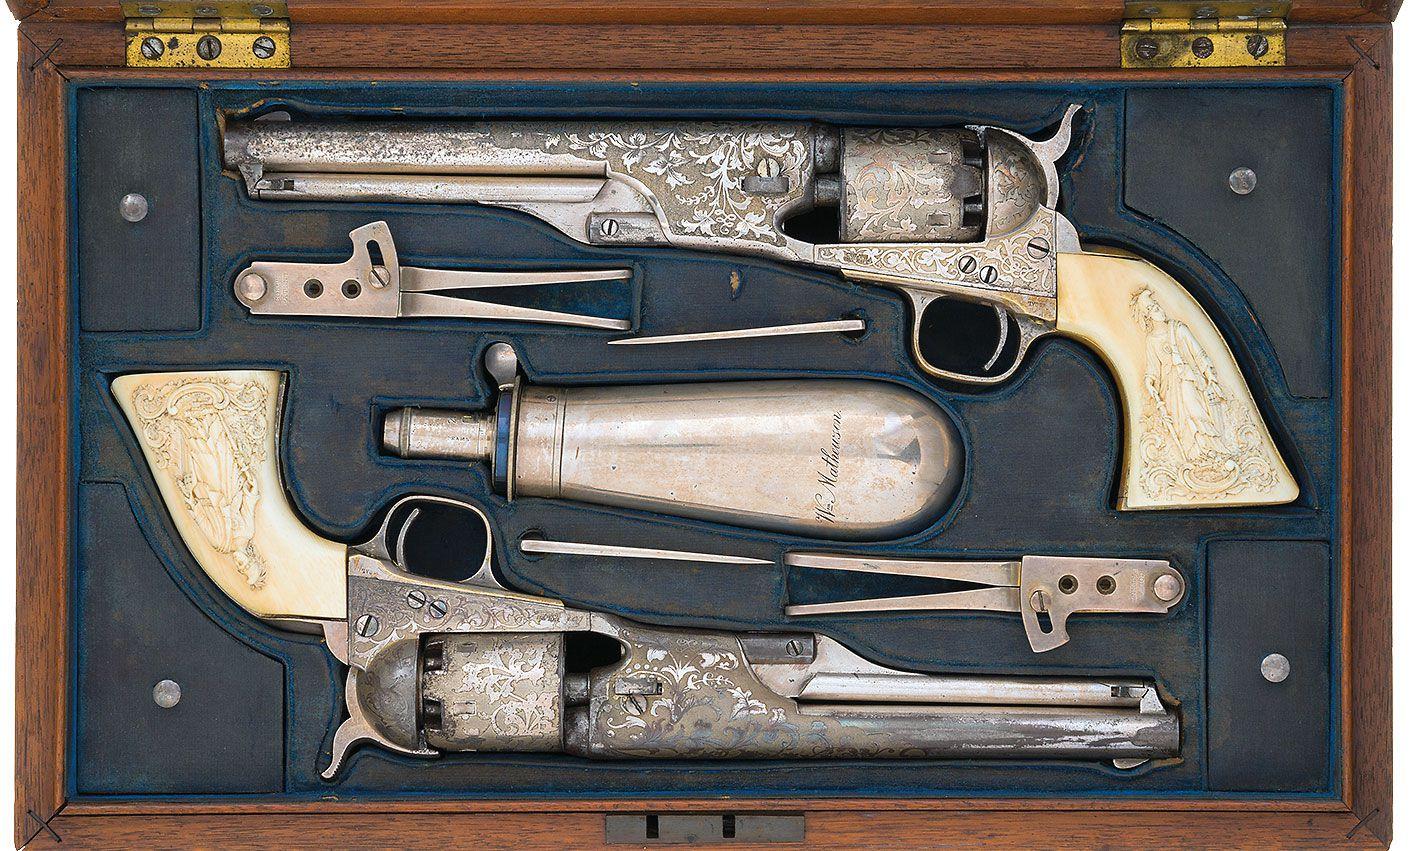 tiffany silver gun set william mathewson true west magazine